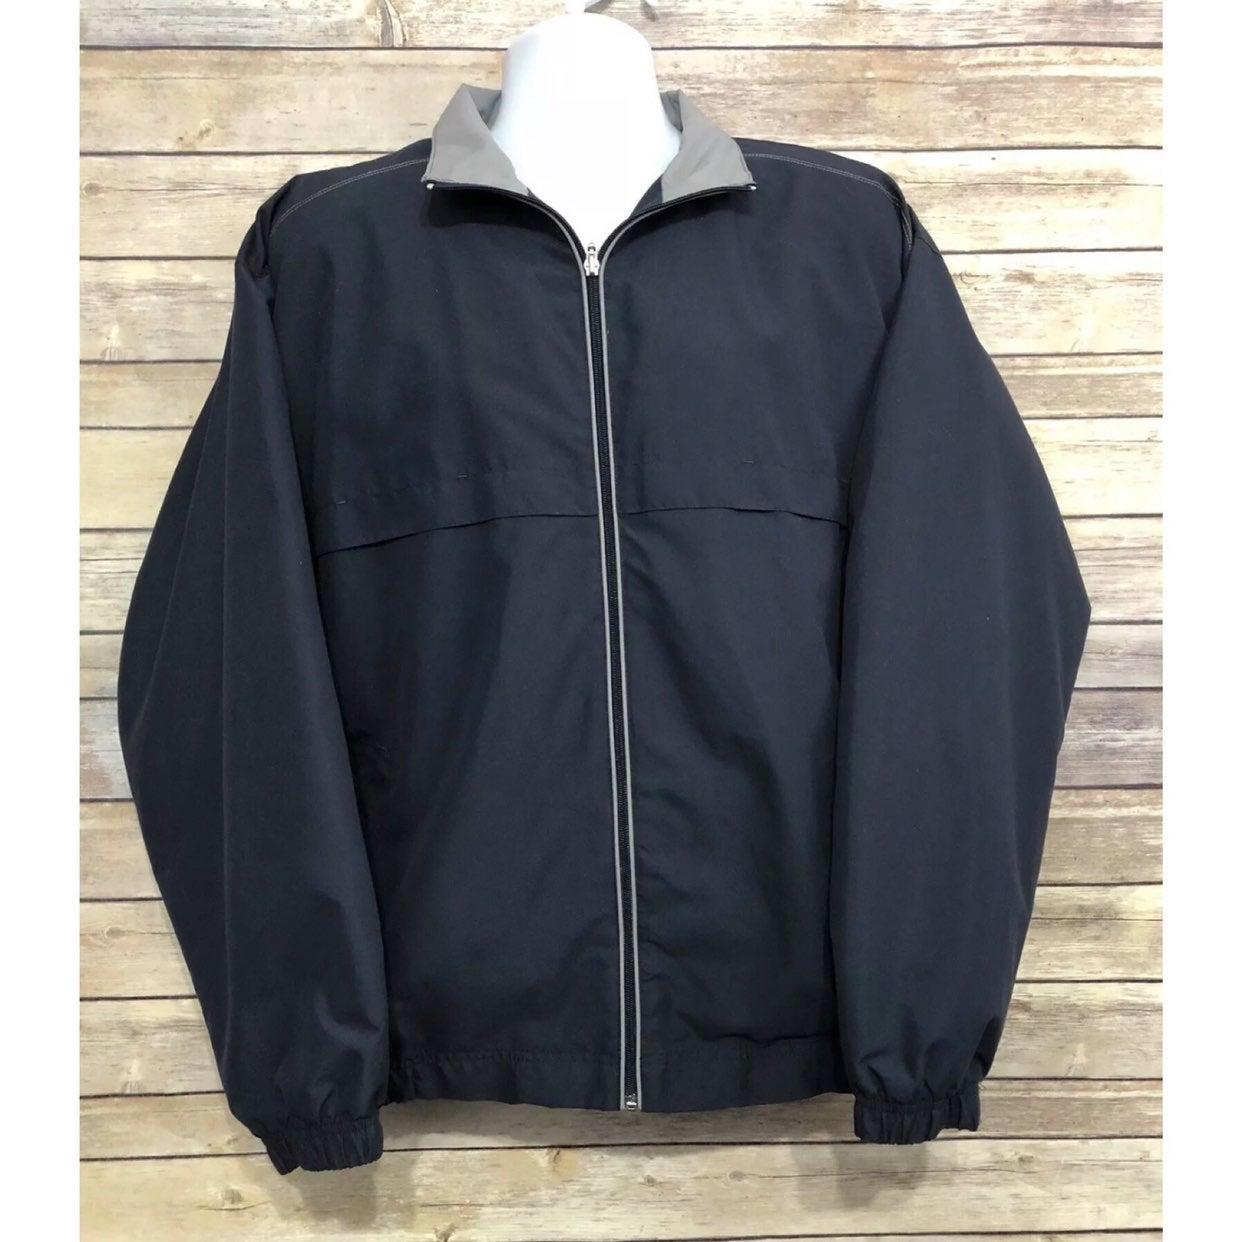 Weatherproof Garment Company Jacket Men